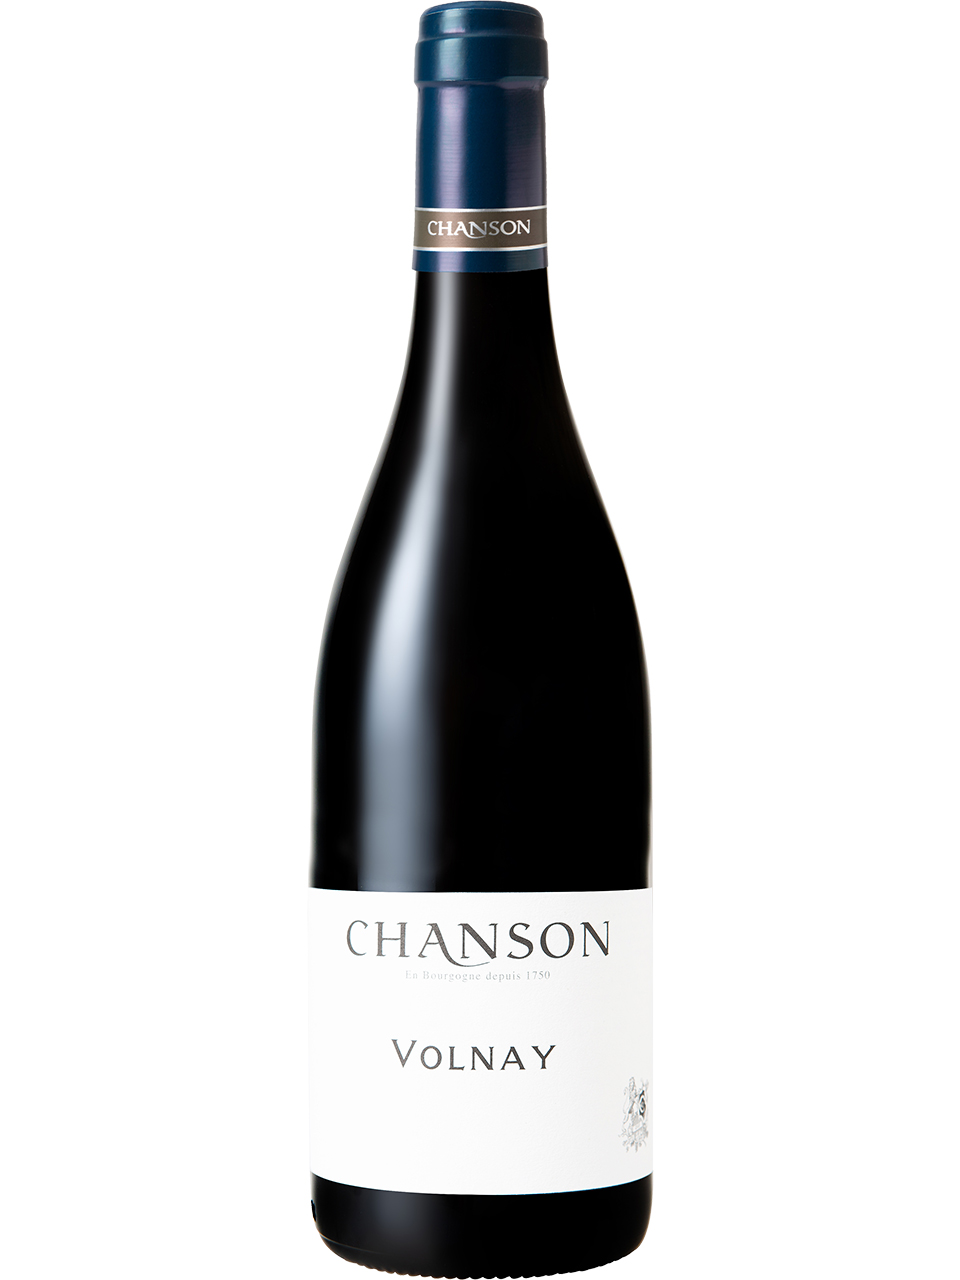 Chanson Volnay